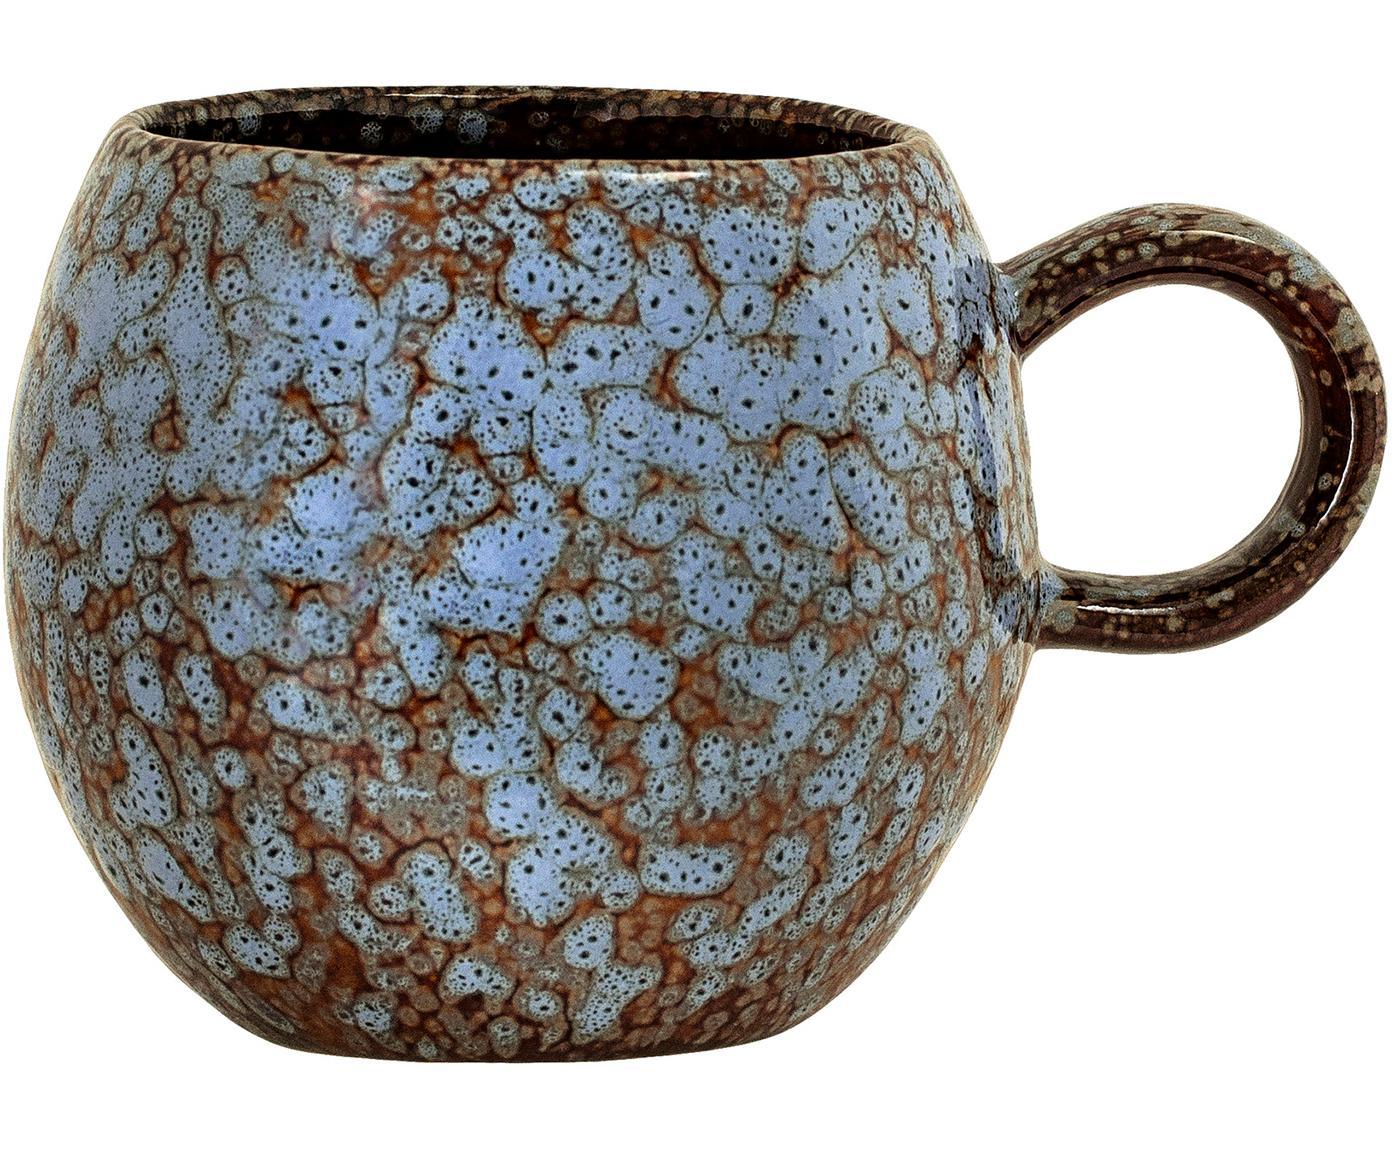 Tasse Paula mit effektvoller Glasur, Steingut, Blau, Braun, Ø 9 x H 8 cm